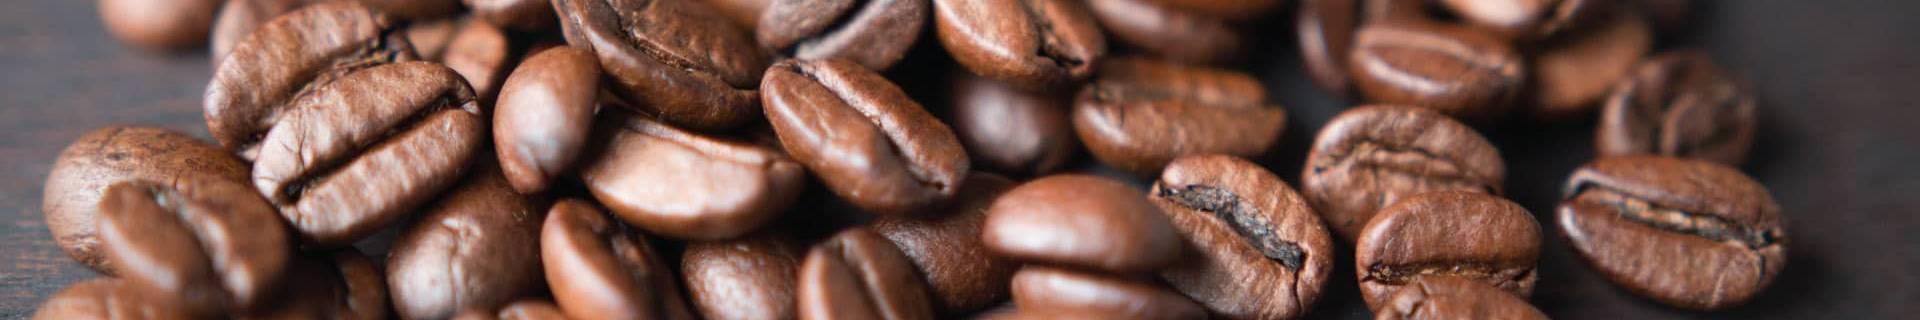 Organic Origin Coffees - ECOLECTIA